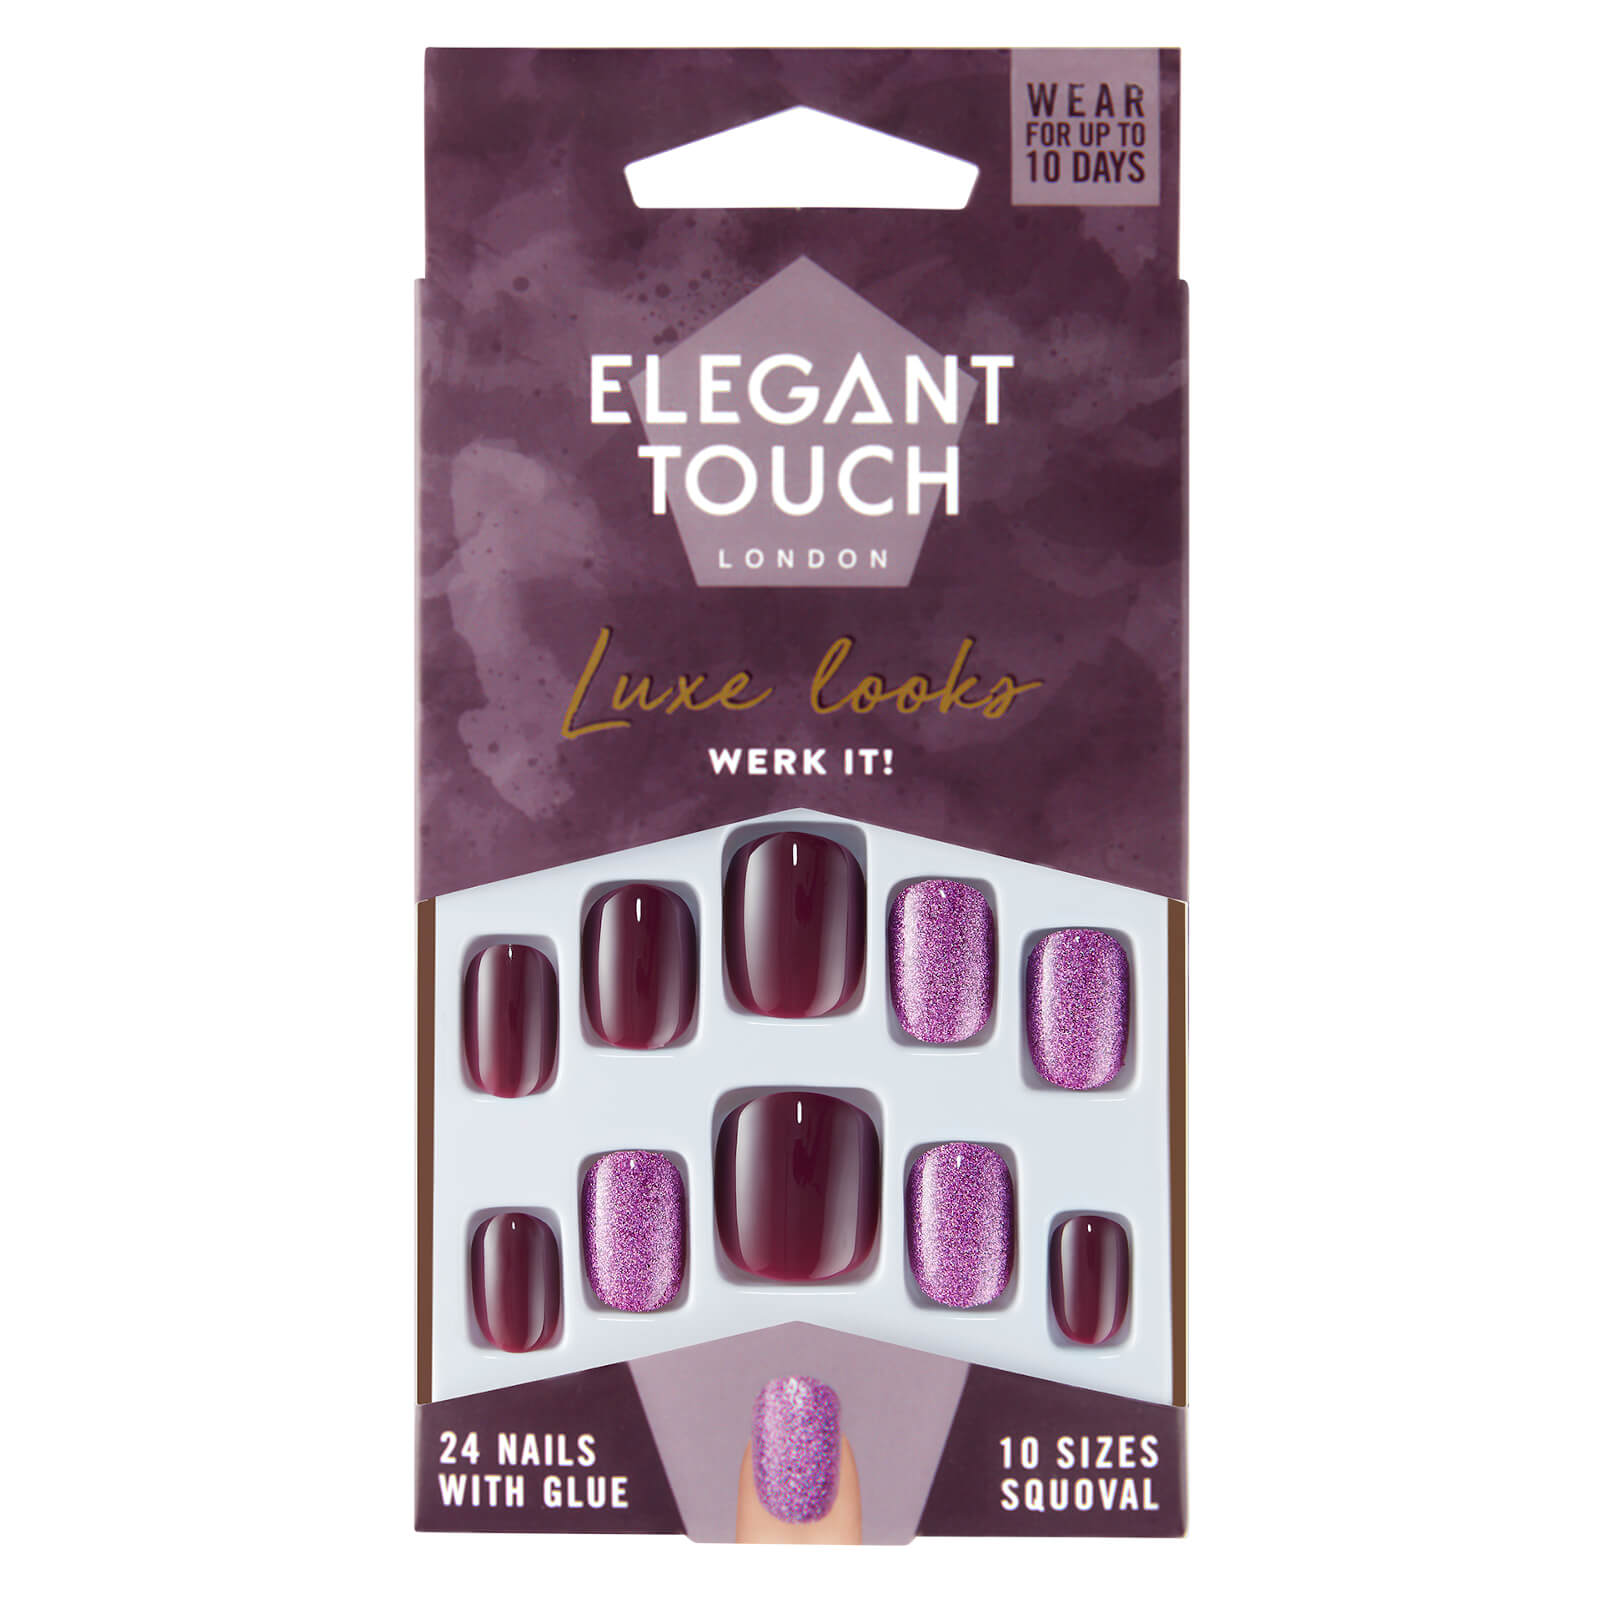 Купить Elegant Touch Luxe Looks Werk it Nails